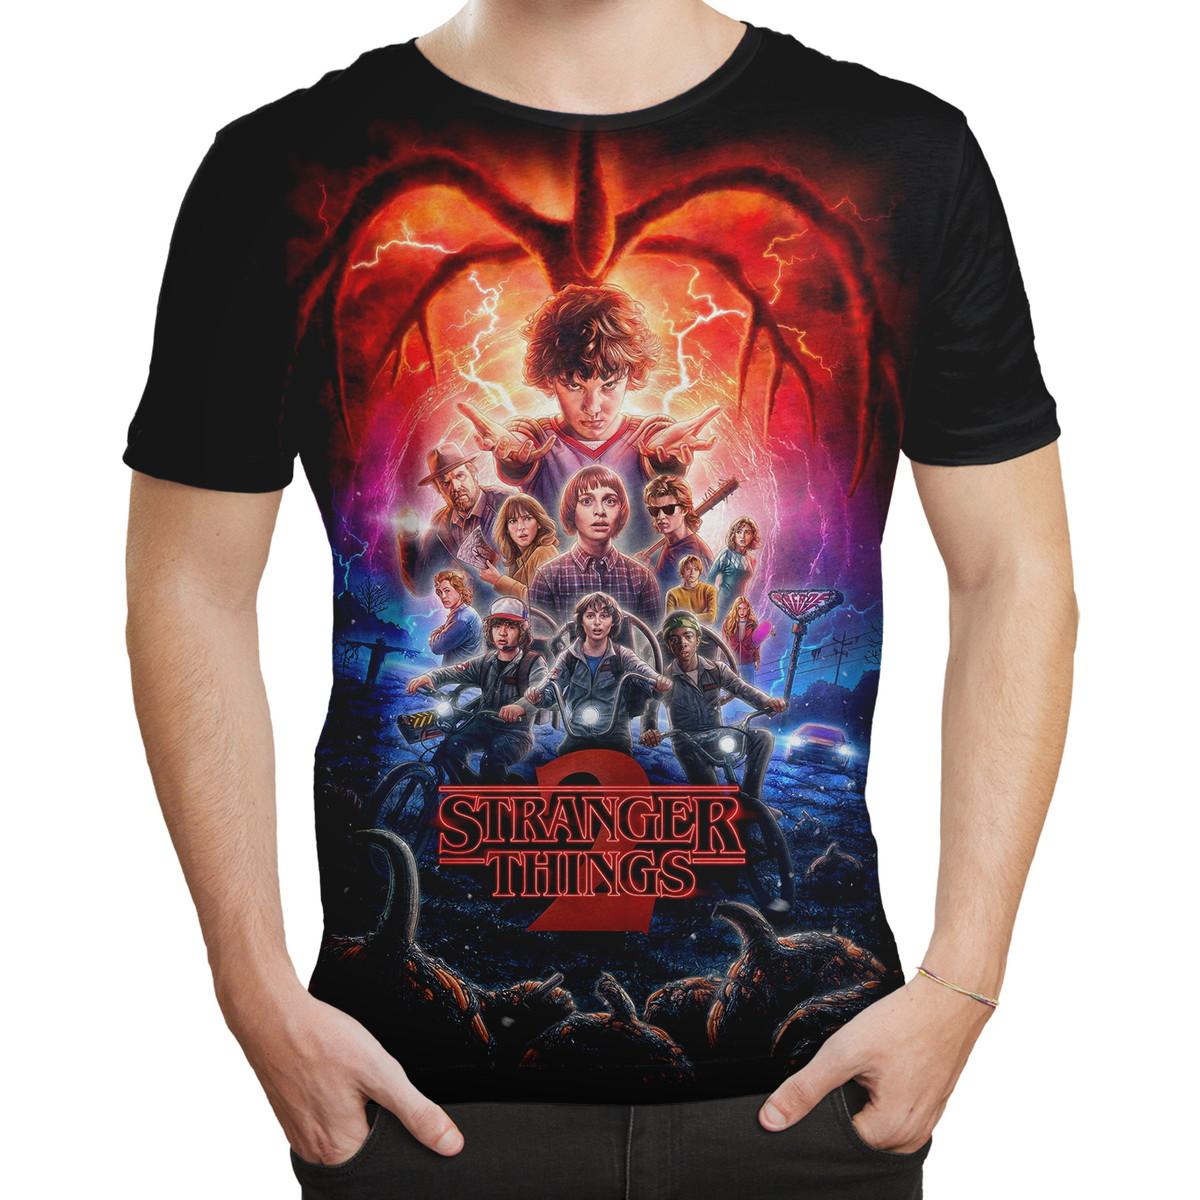 b617ea5c9e562 Camiseta Masculina série Stranger Things MD03 no Elo7 | Simbiose TV ...